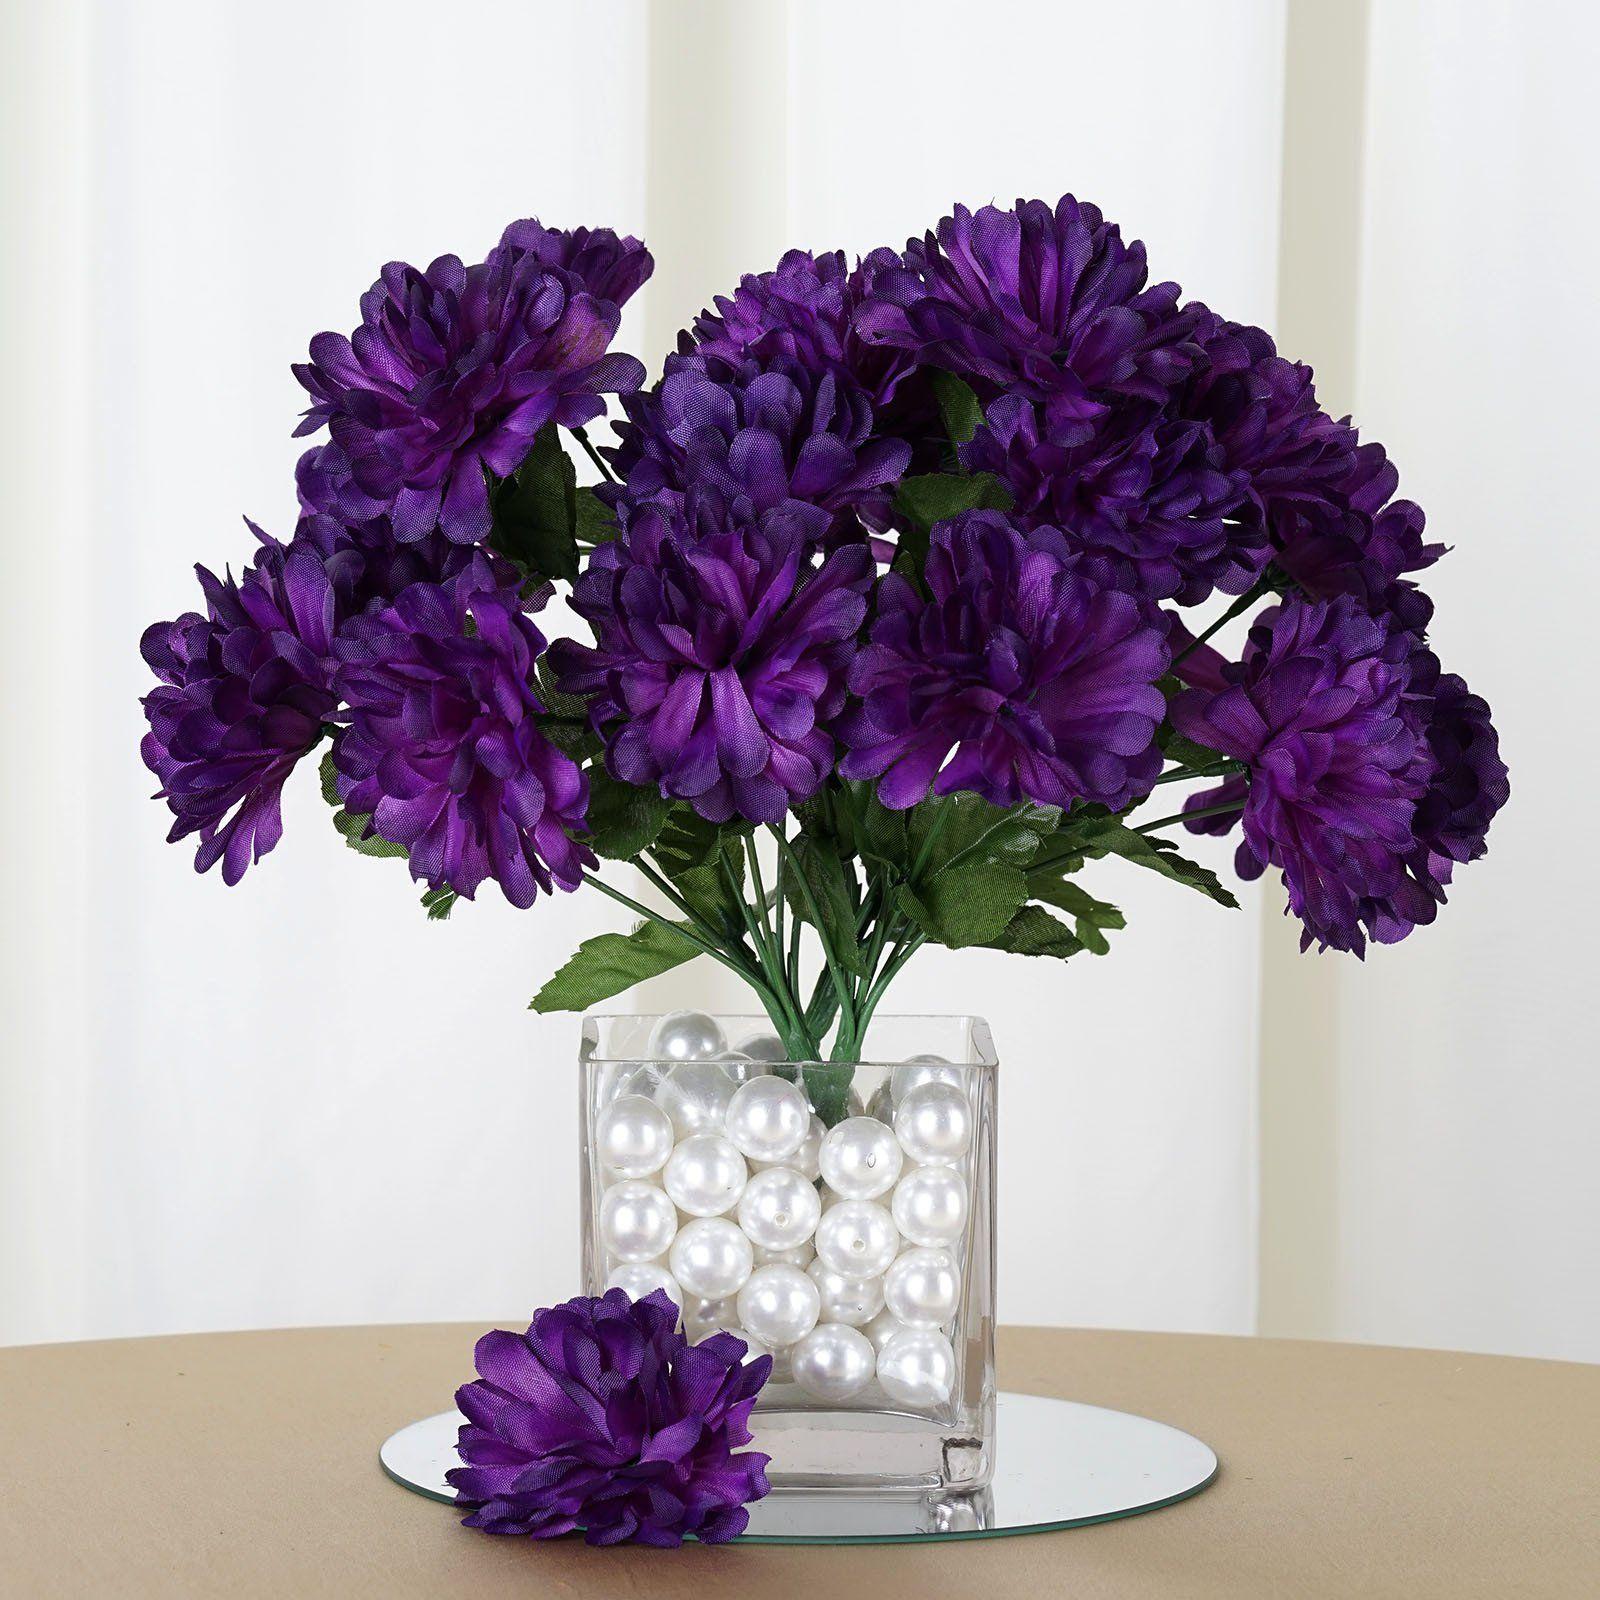 84 Artificial Silk Chrysanthemum Wedding Flower Bush Bouquet Centerpiece Decor - Purple